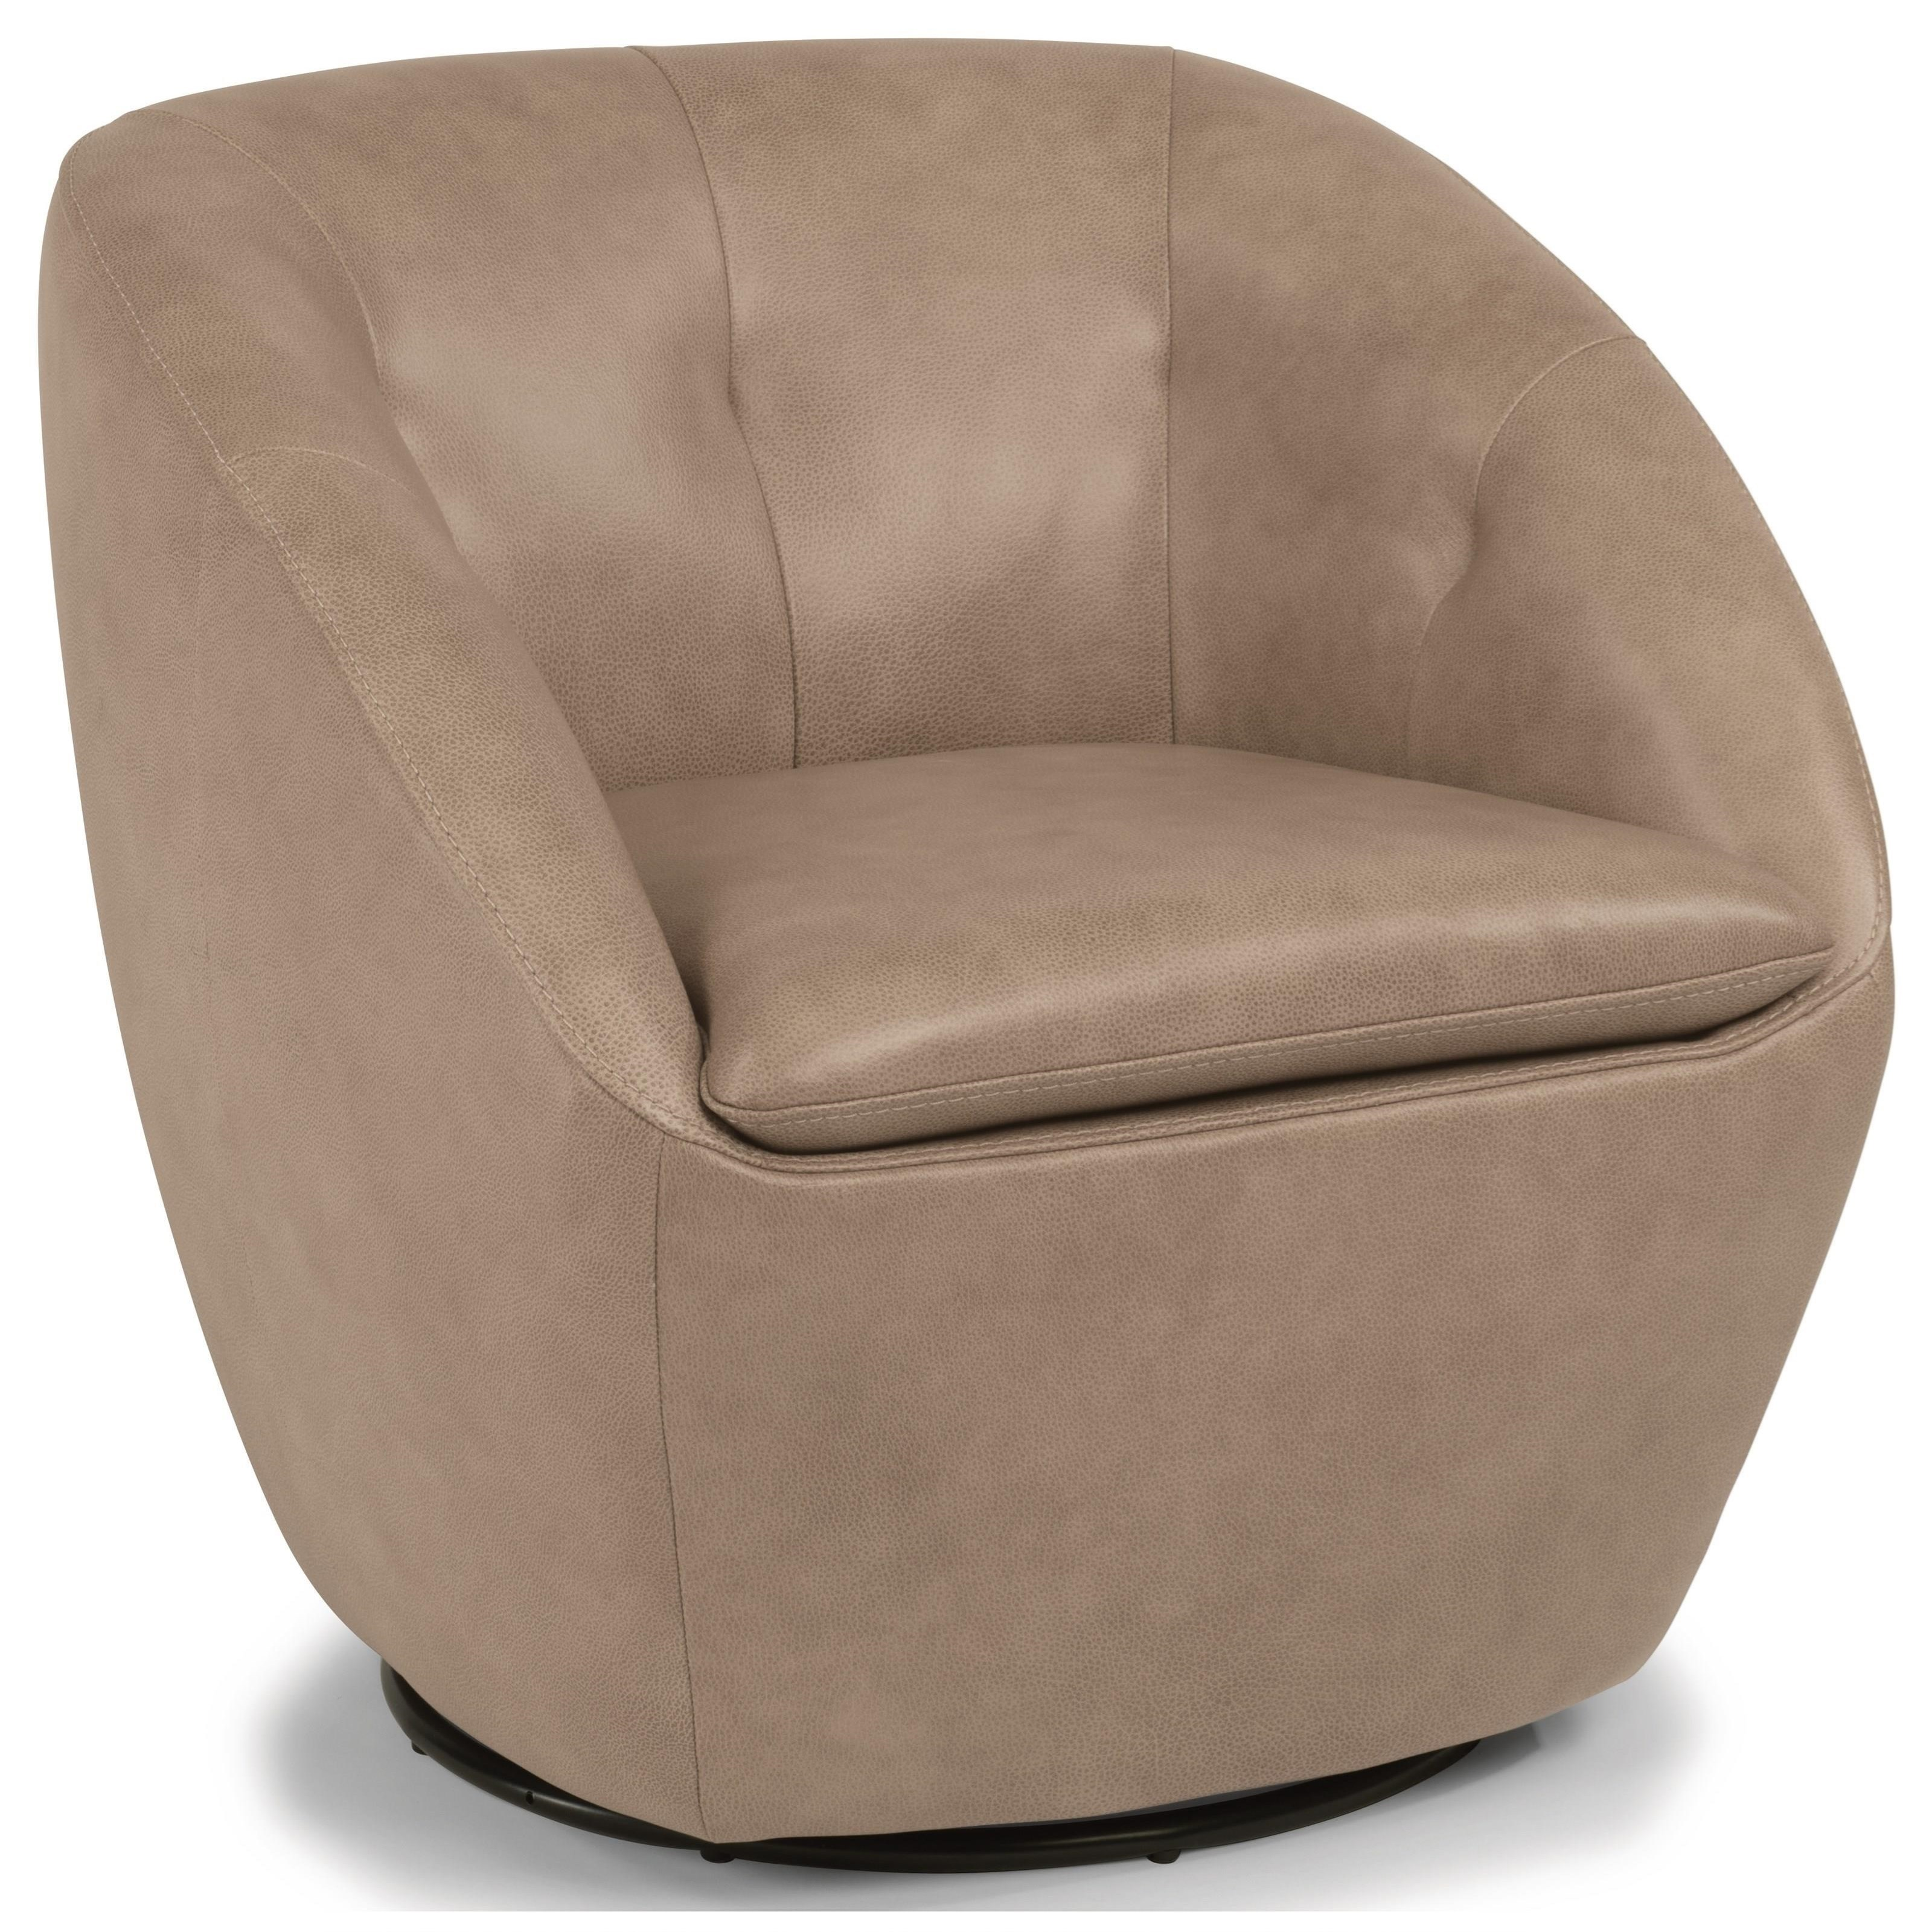 Latitudes - Wade Swivel Chair  by Flexsteel at Walker's Furniture